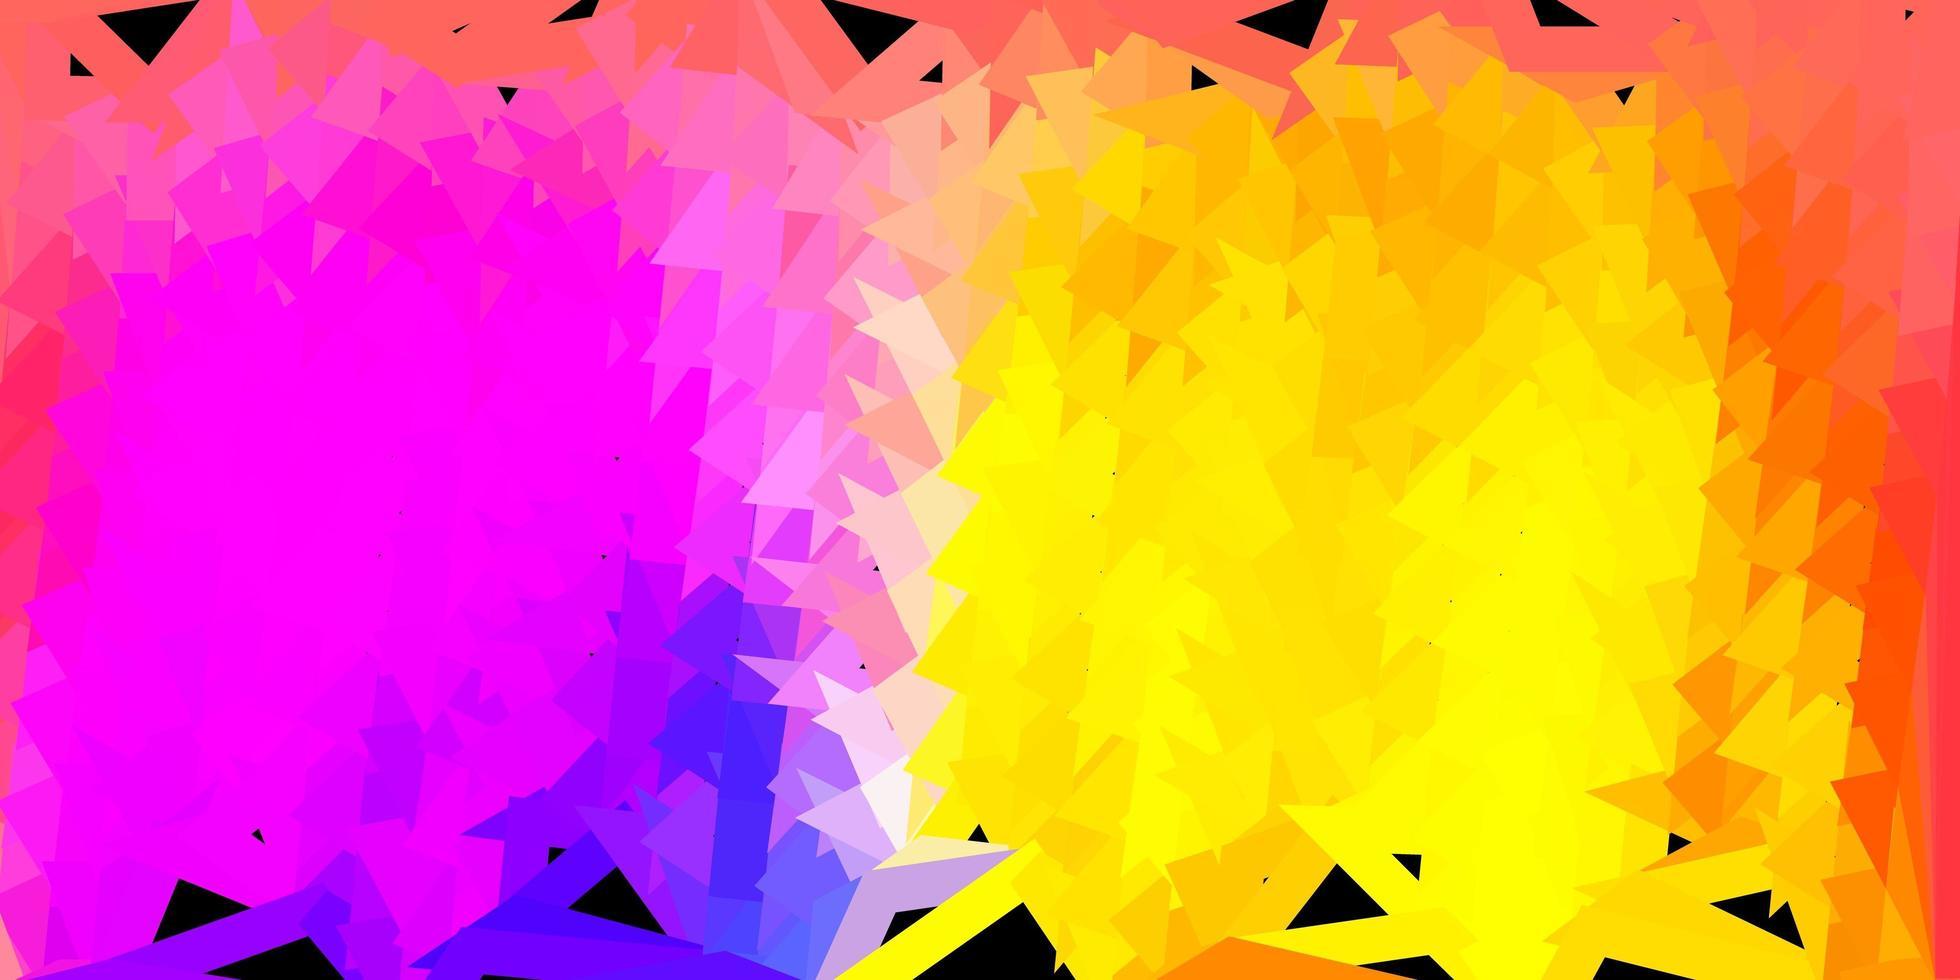 motif de mosaïque triangle vecteur bleu clair, jaune.